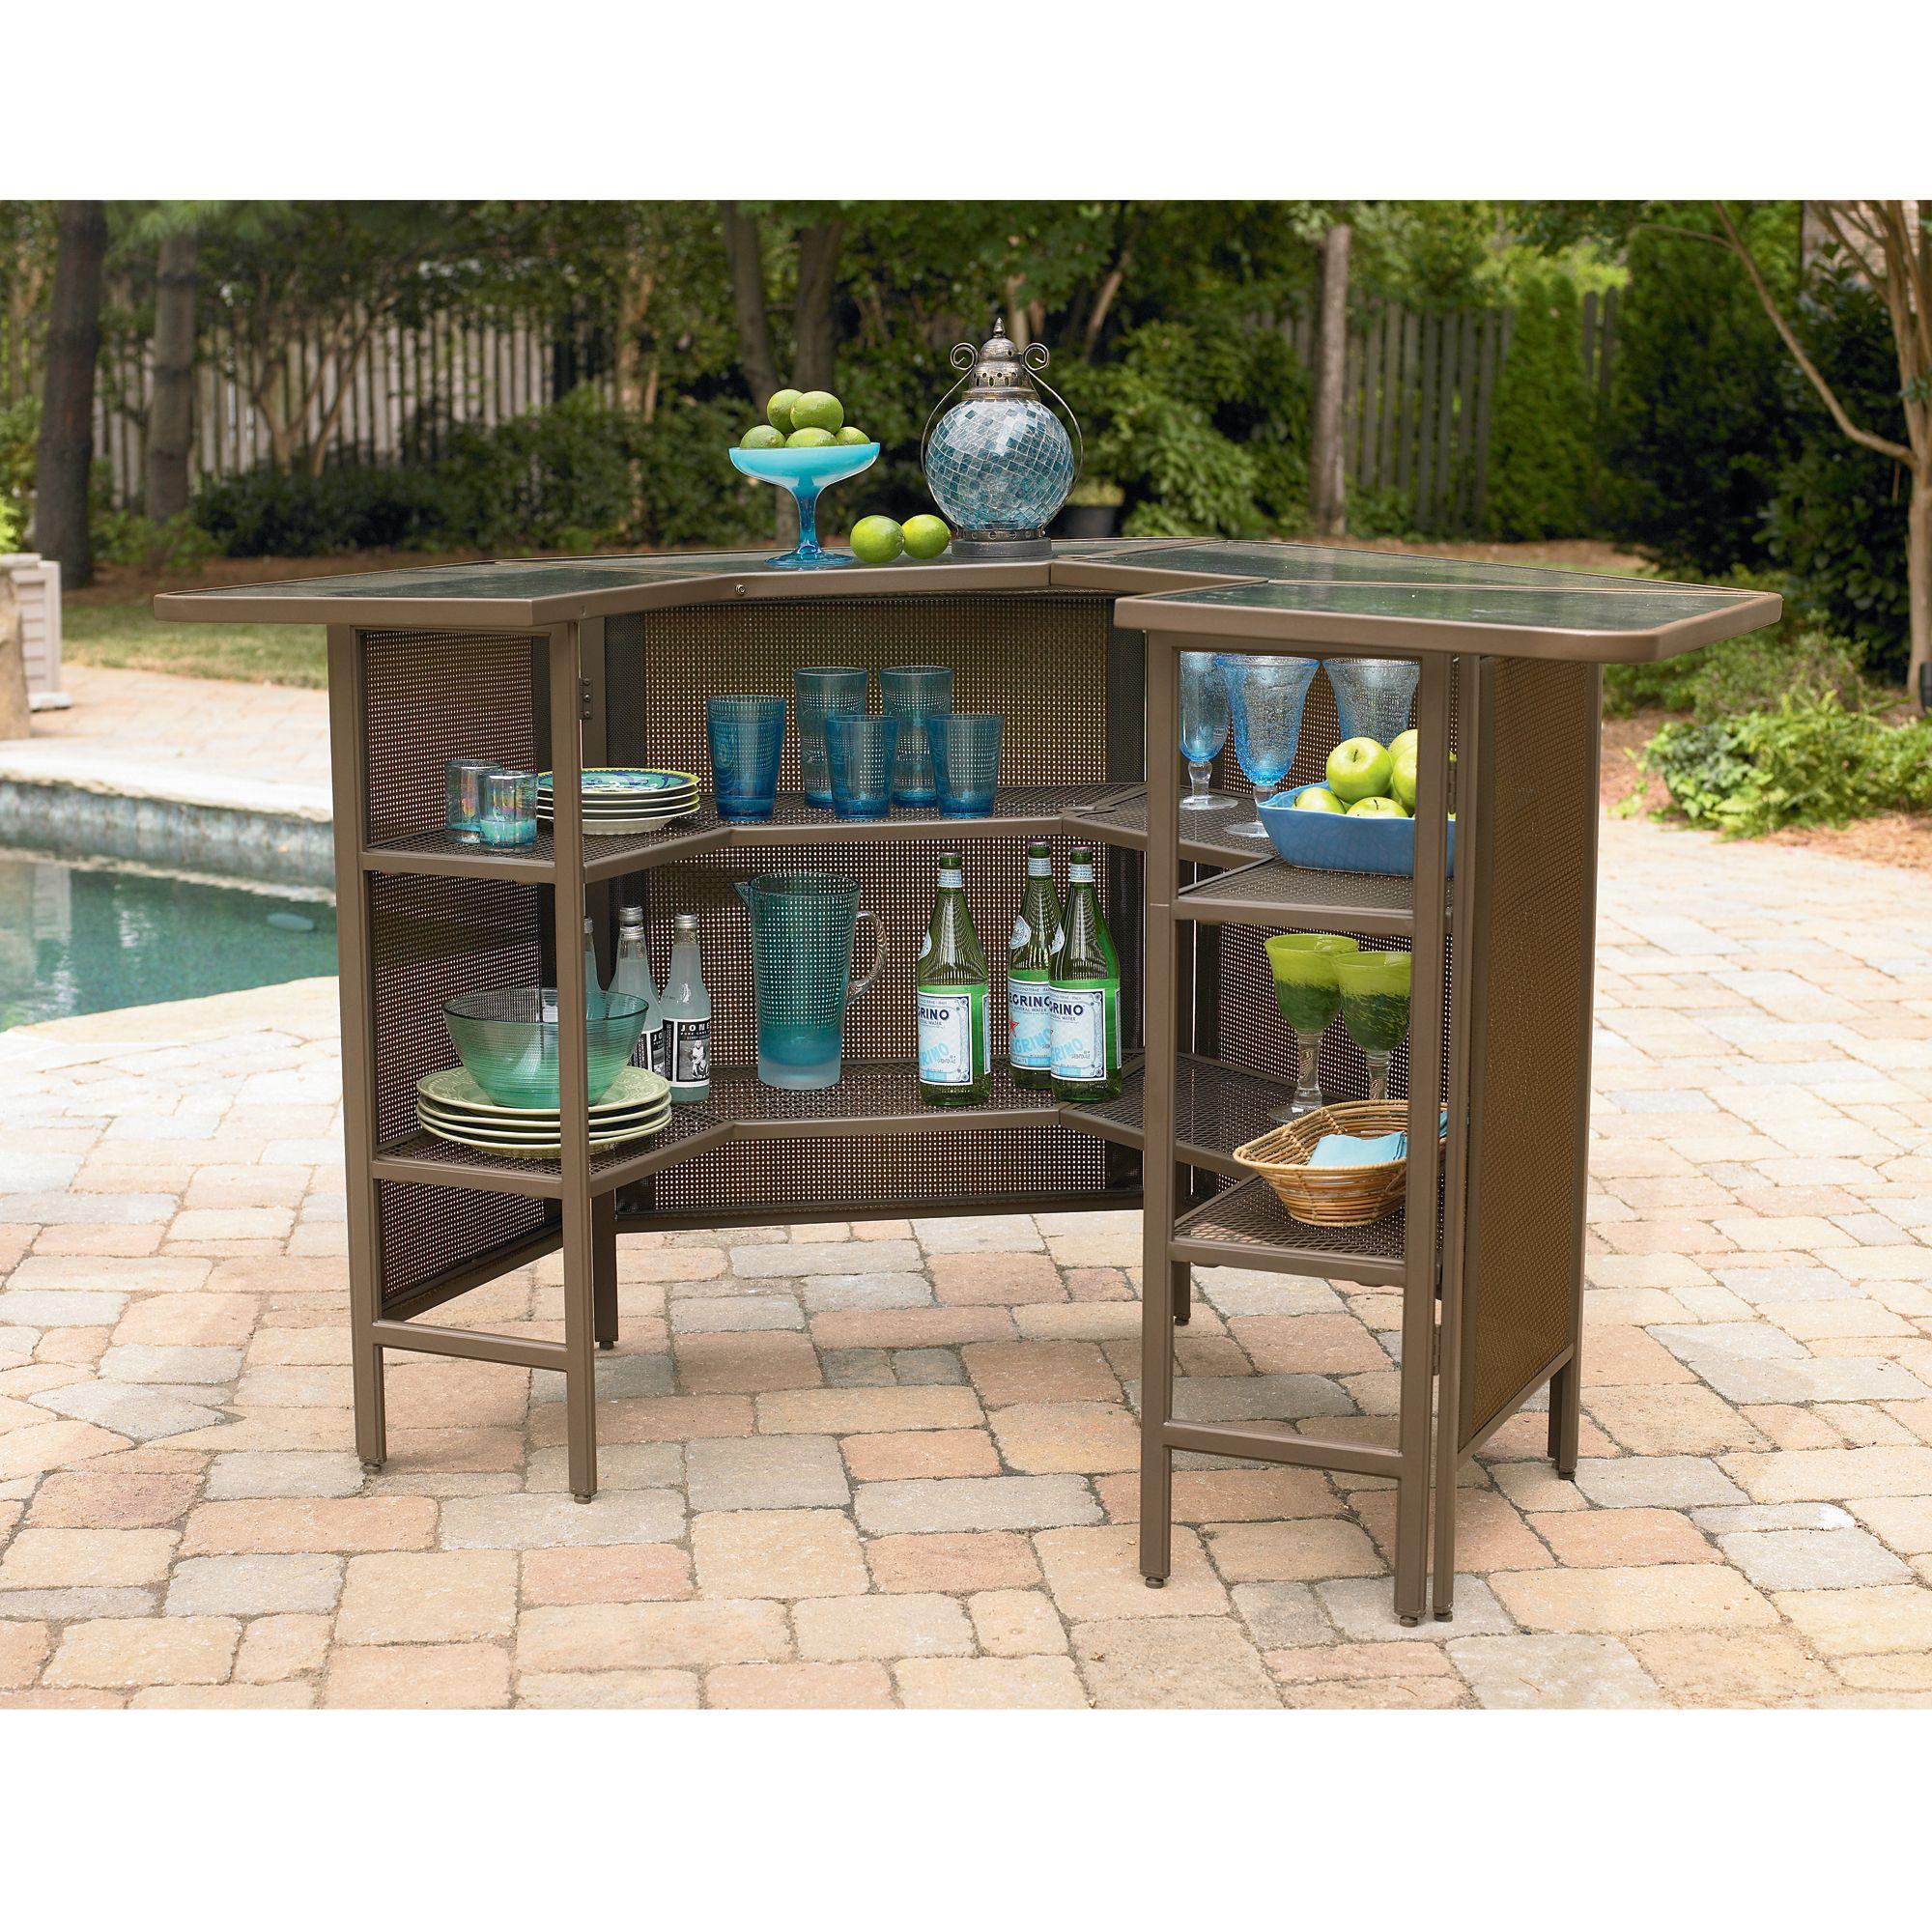 Garden Oasis Saratoga 5-Piece Bar Set*